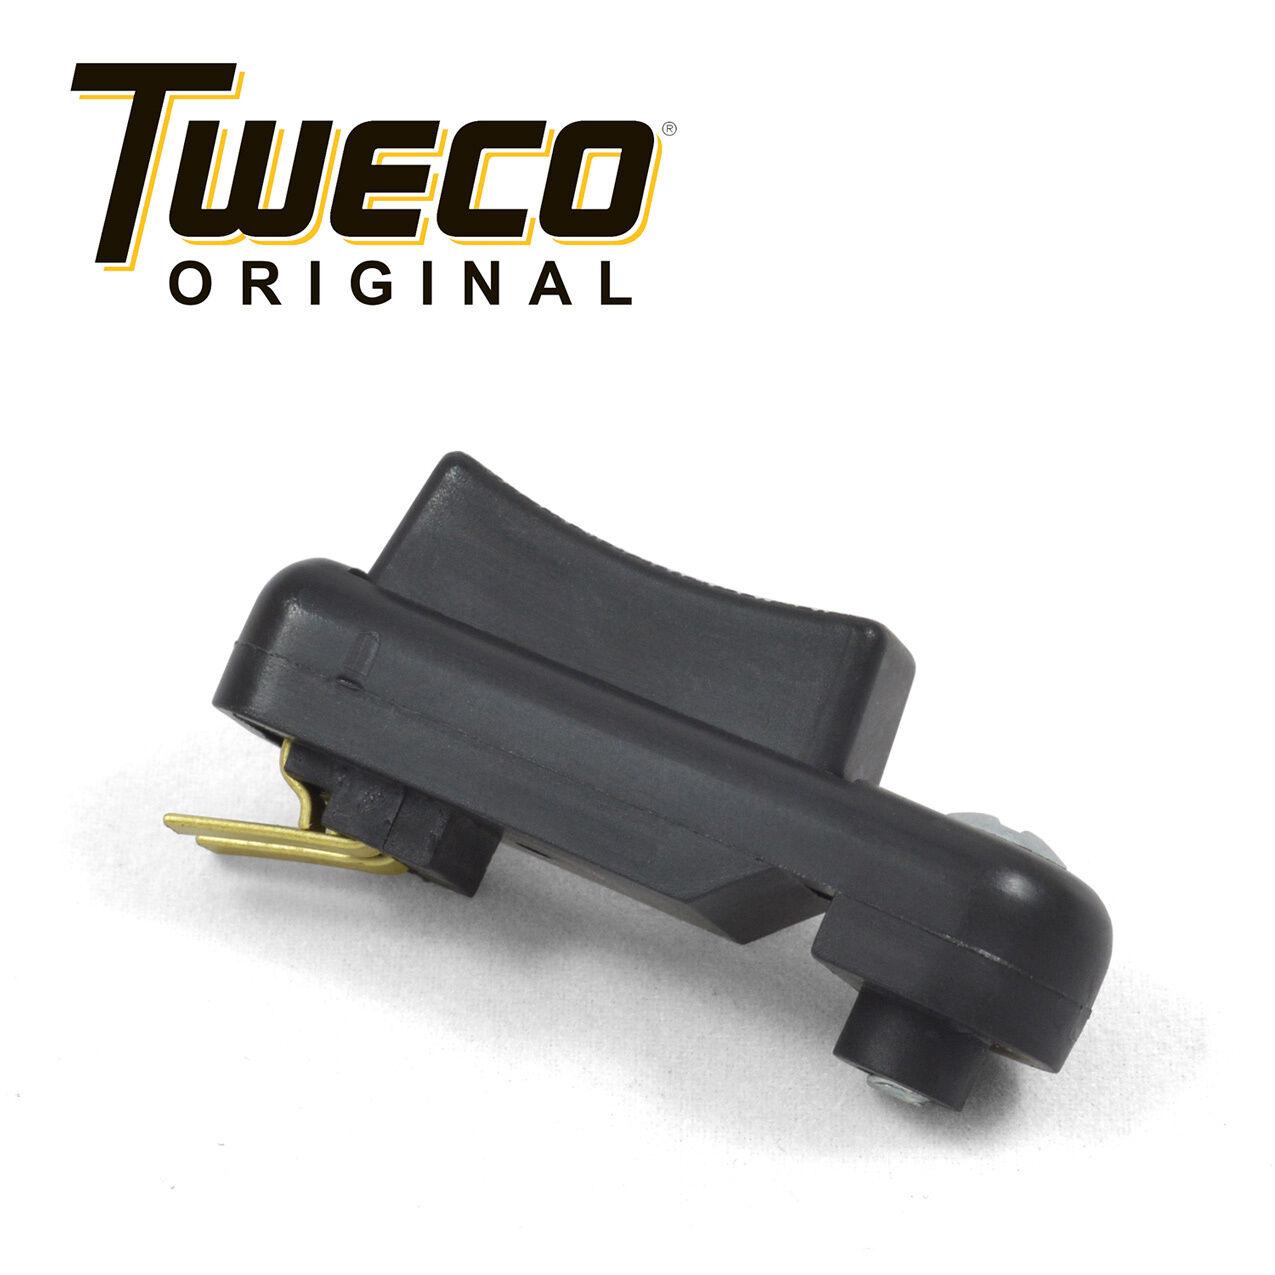 Tweco Mini-Mig Welding Gun Trigger Switch 35-90